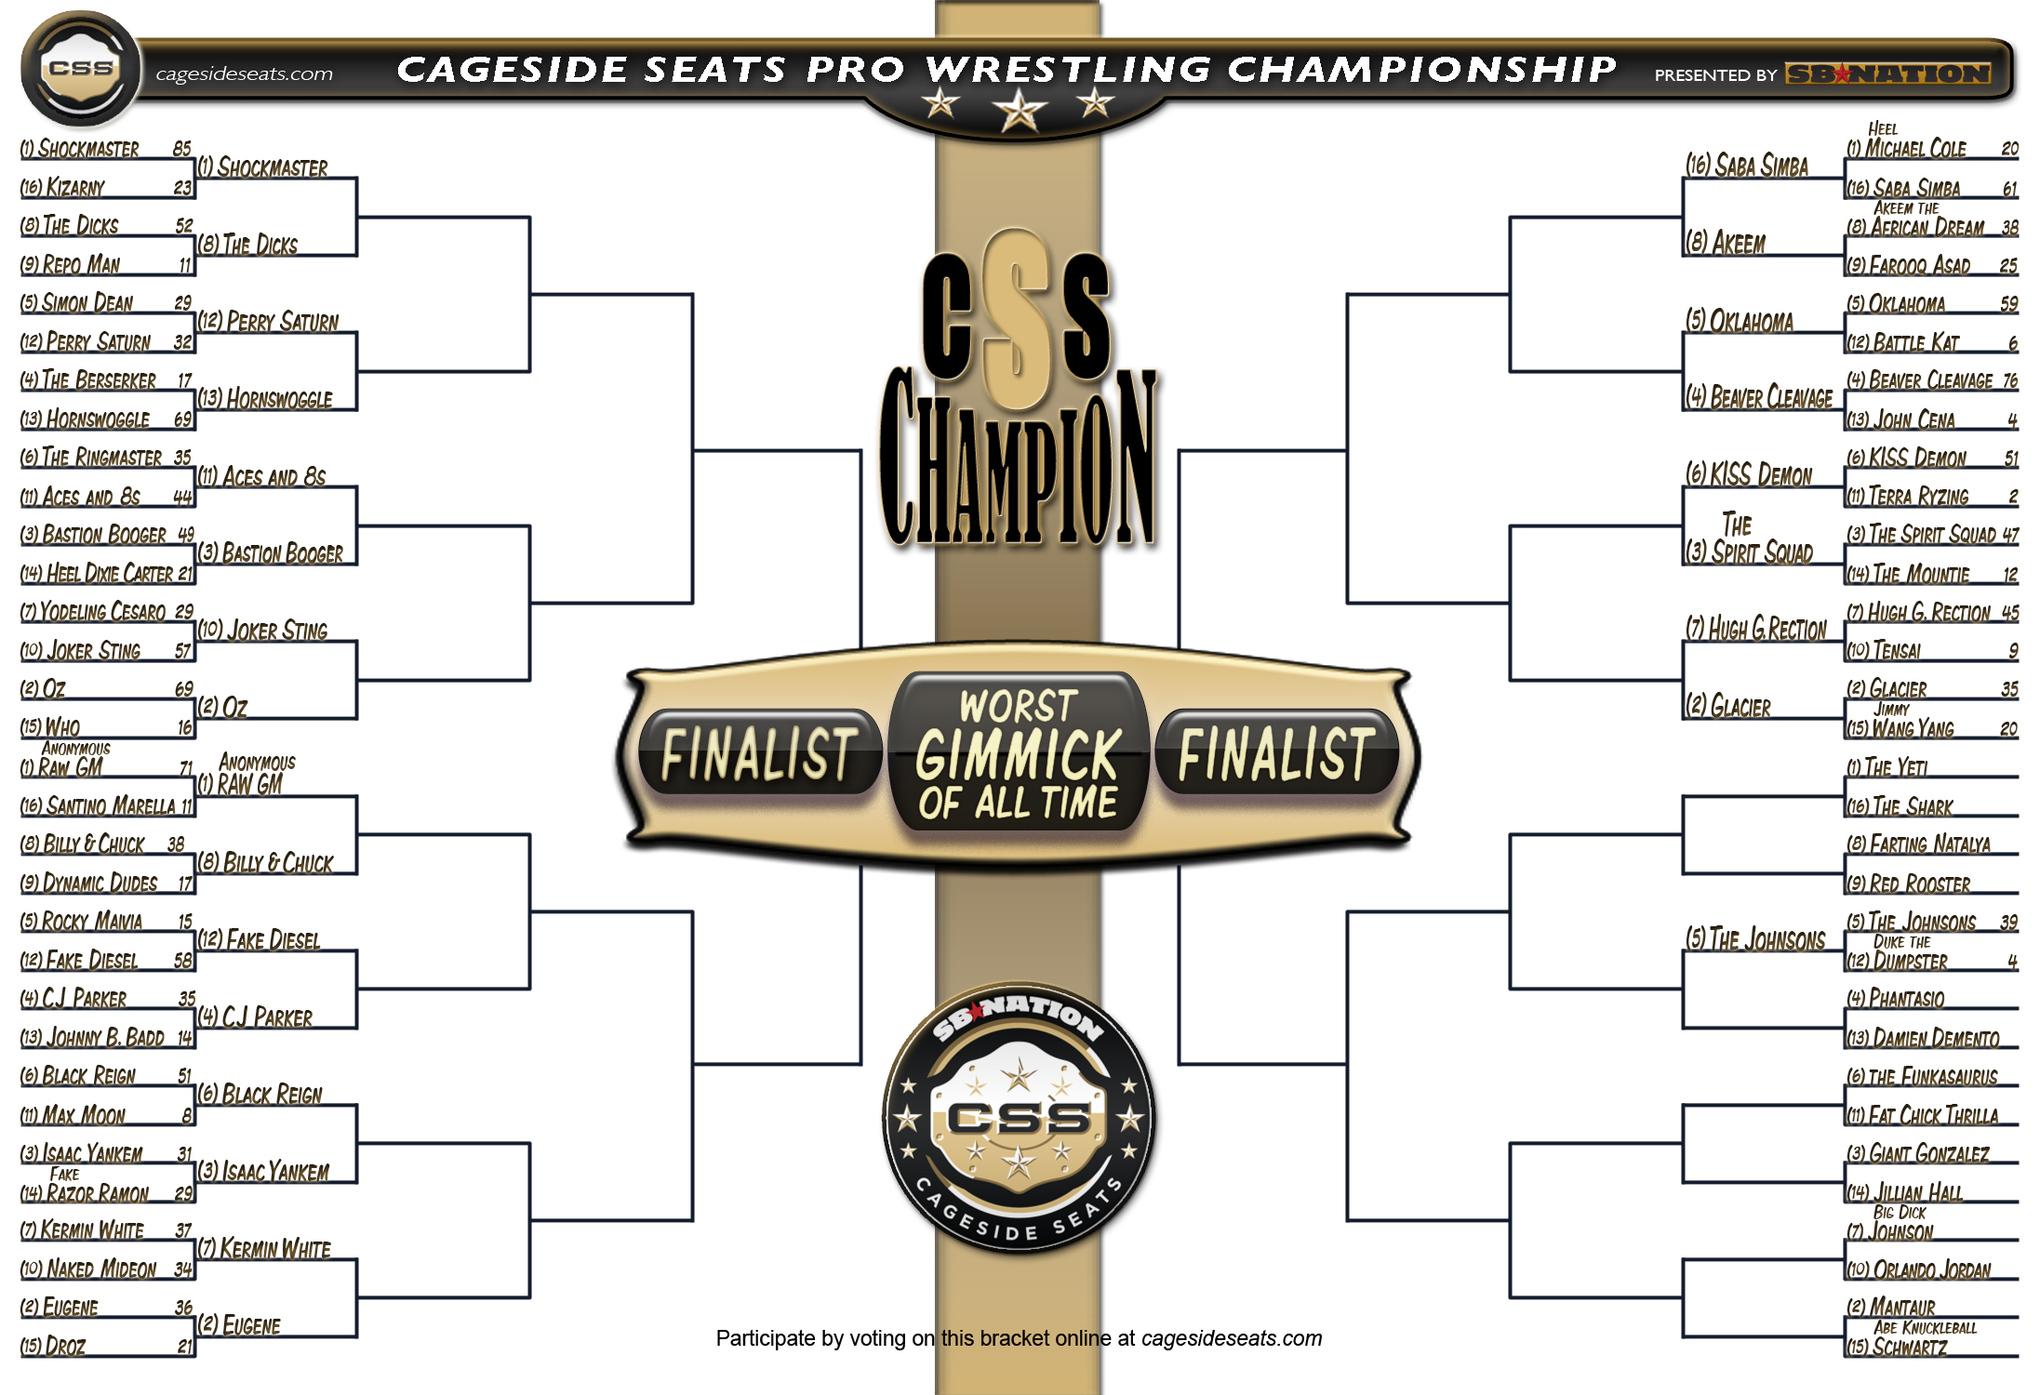 Worst Gimmick Tournament First Round Match: (7) Big Dick Johnson vs. (10)  Orlando Jordan